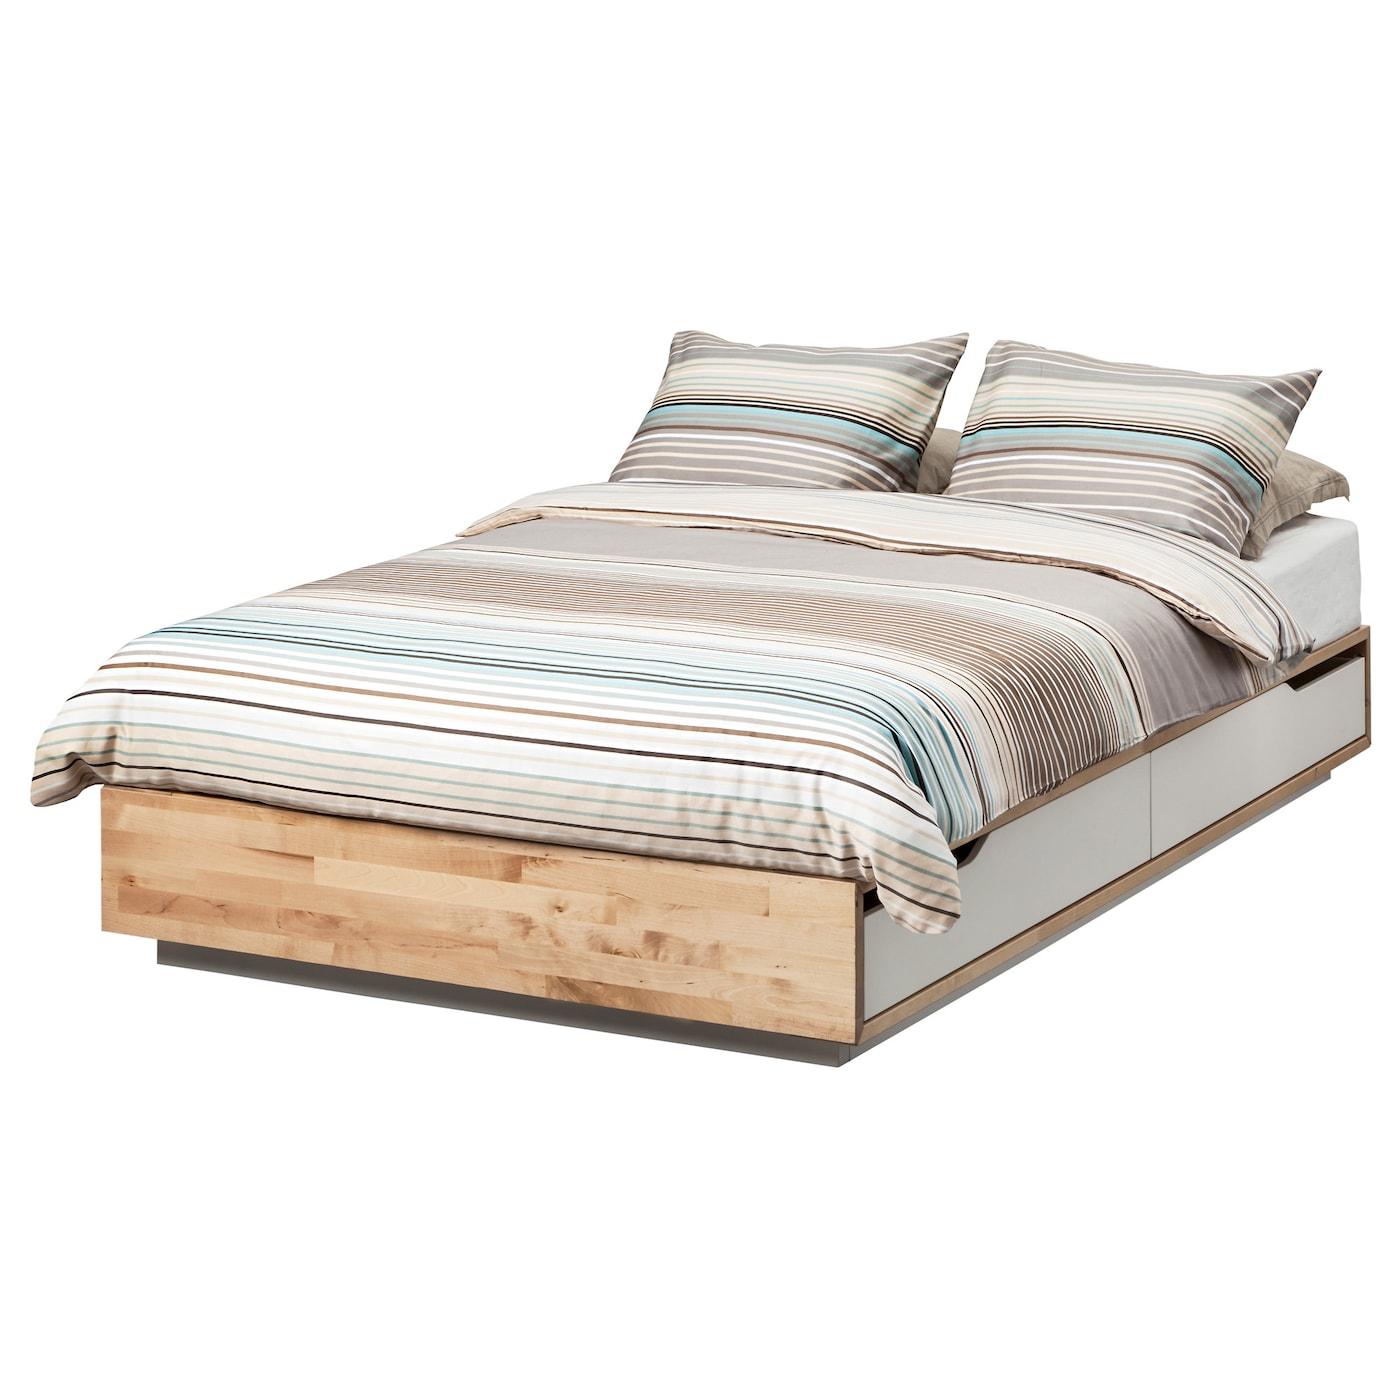 Mandal Bed Frame With Storage Birch White 120x200 Cm Ikea